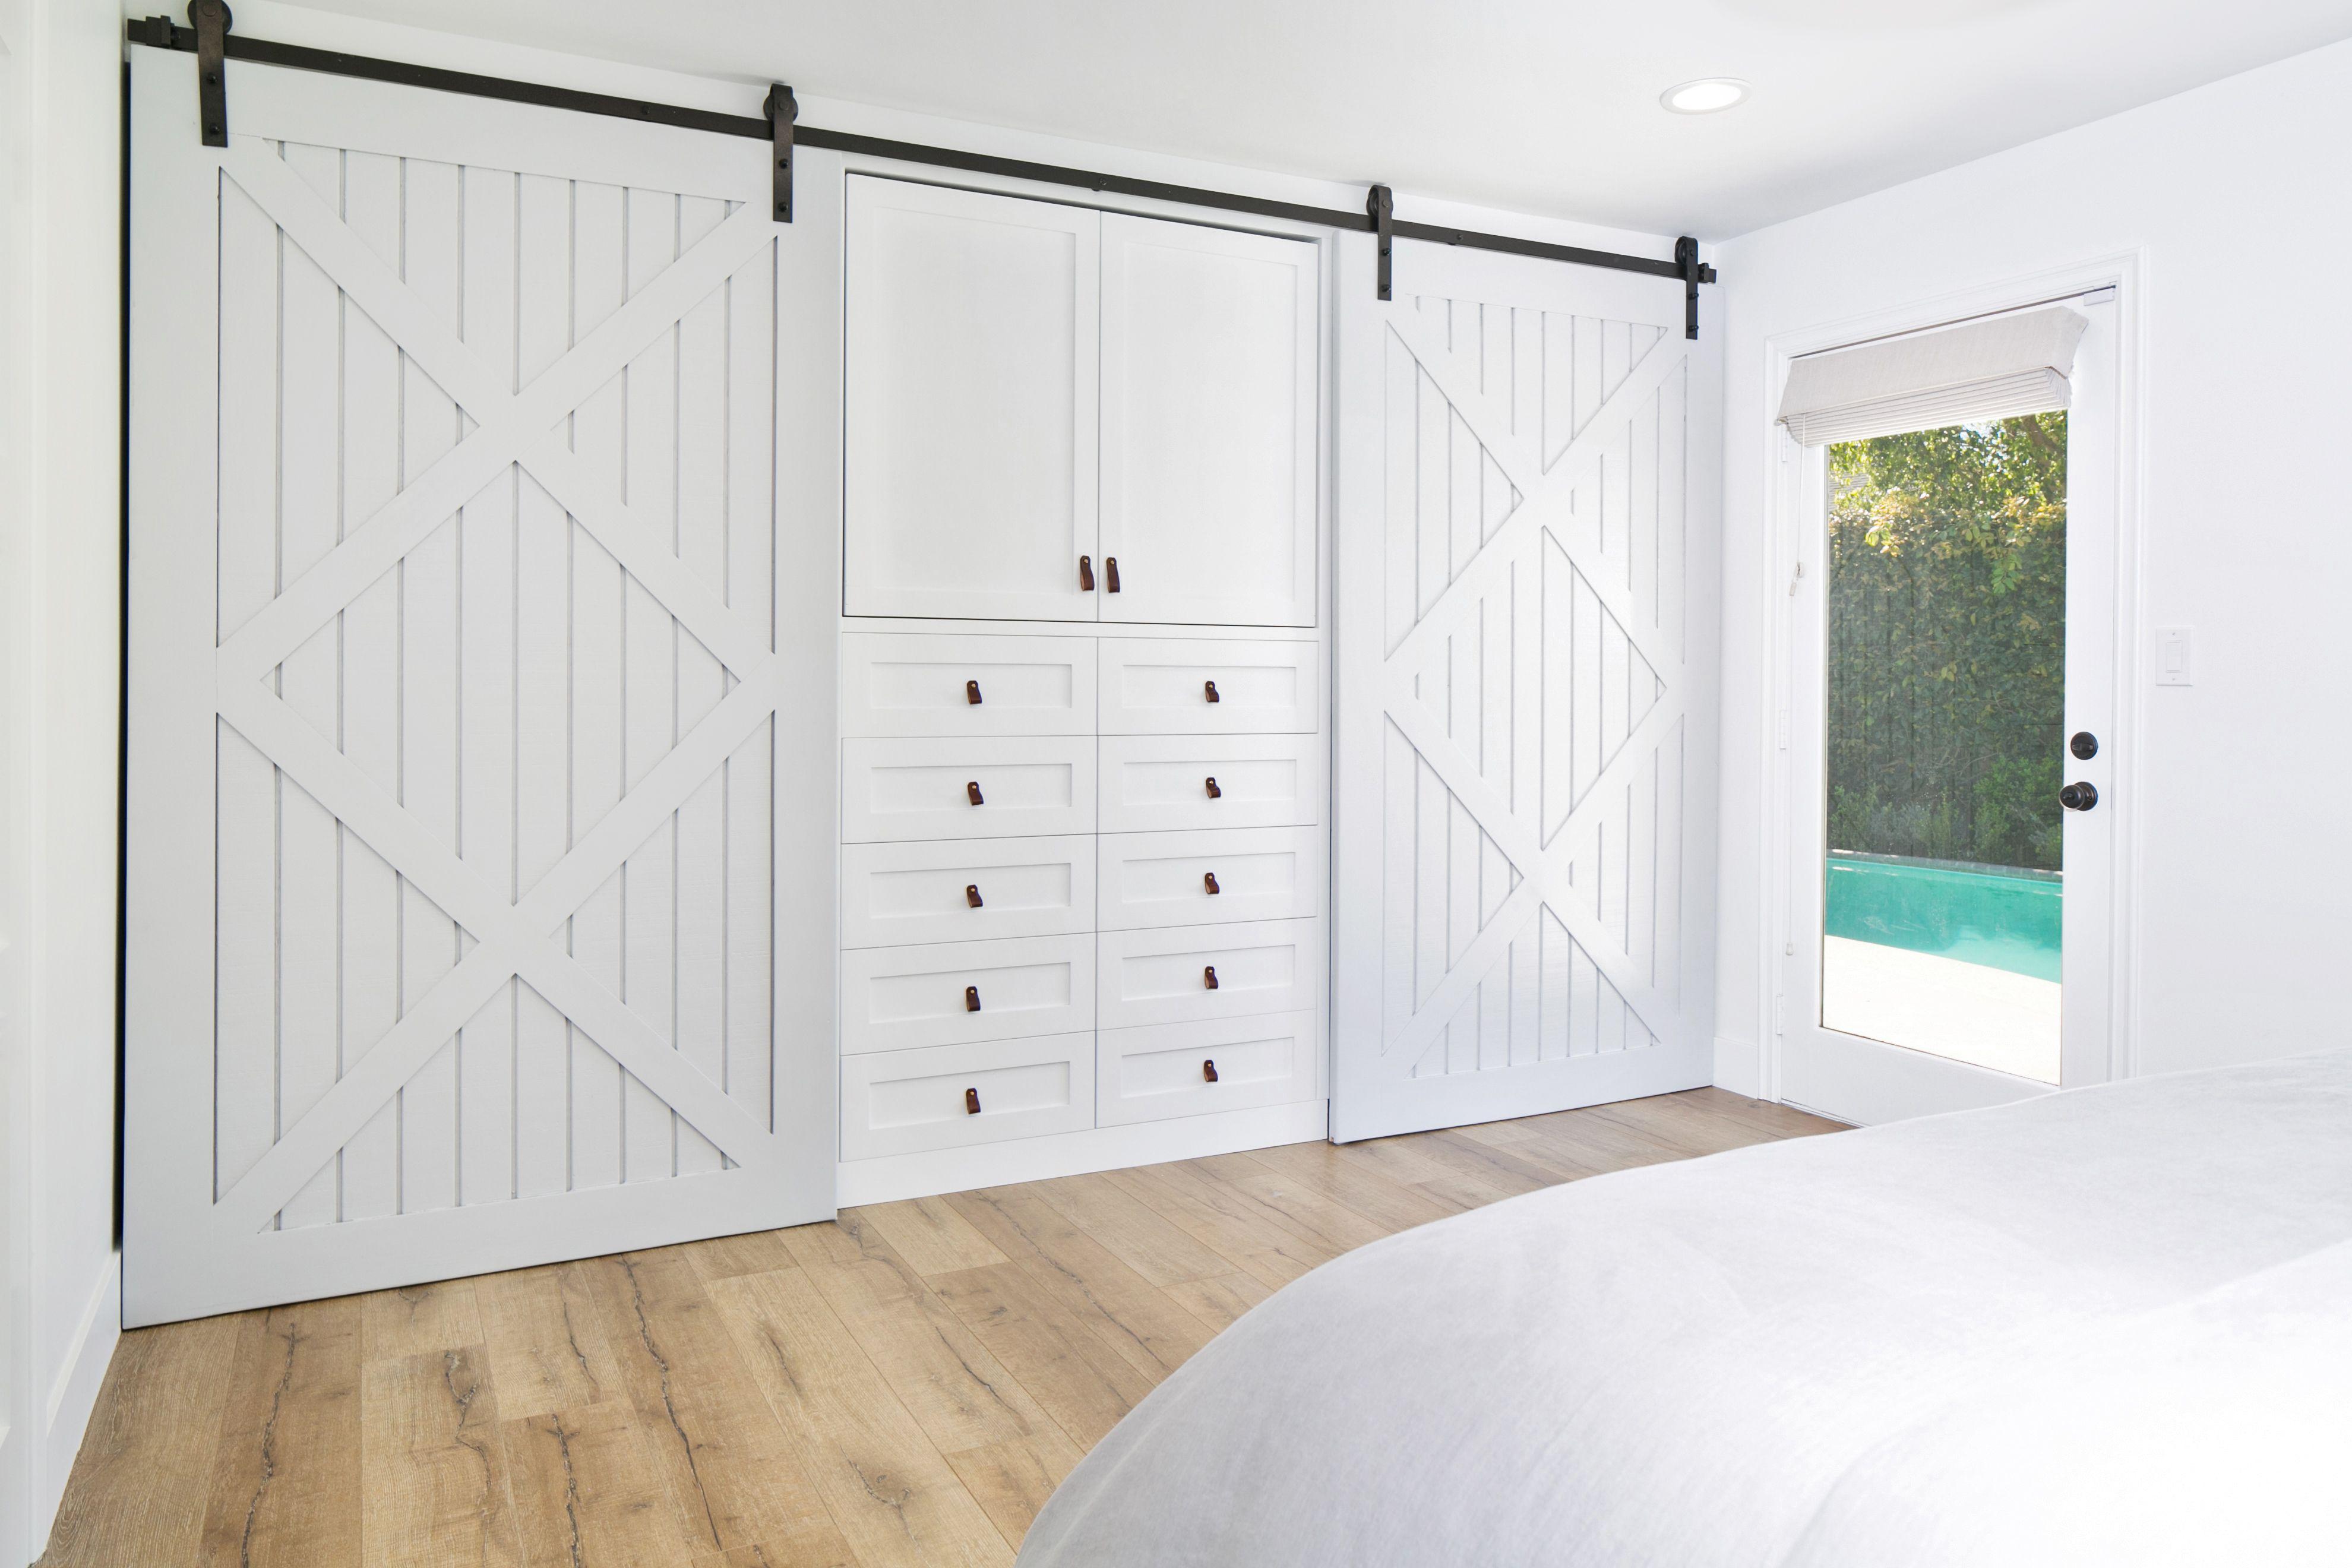 Master bedroom door design  Modern Farmhouse interior design by Lindye Galloway Design Built in